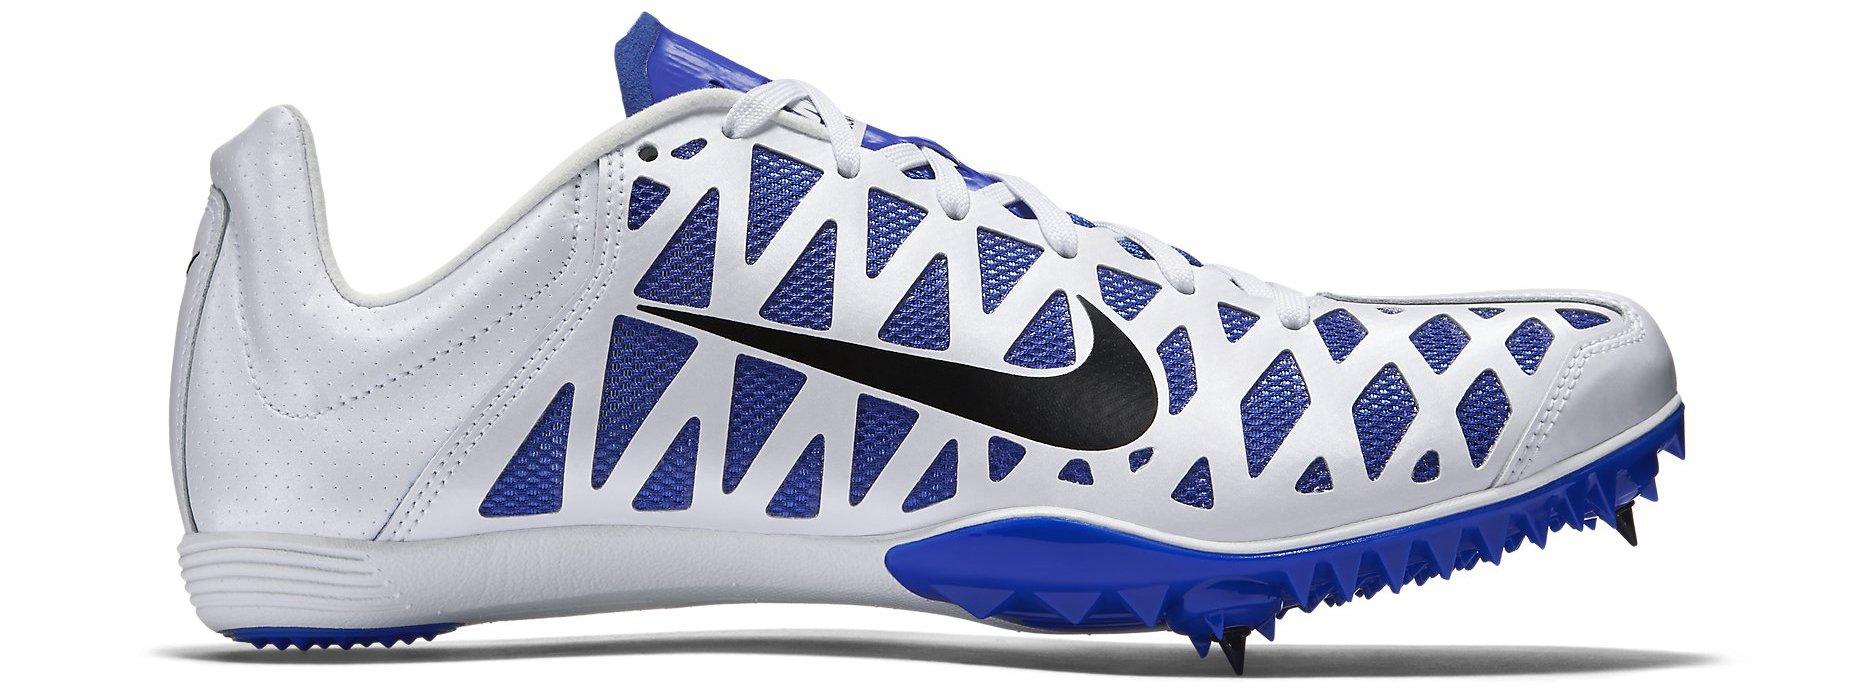 Sprinterské tretry Nike Zoom Maxcat 4